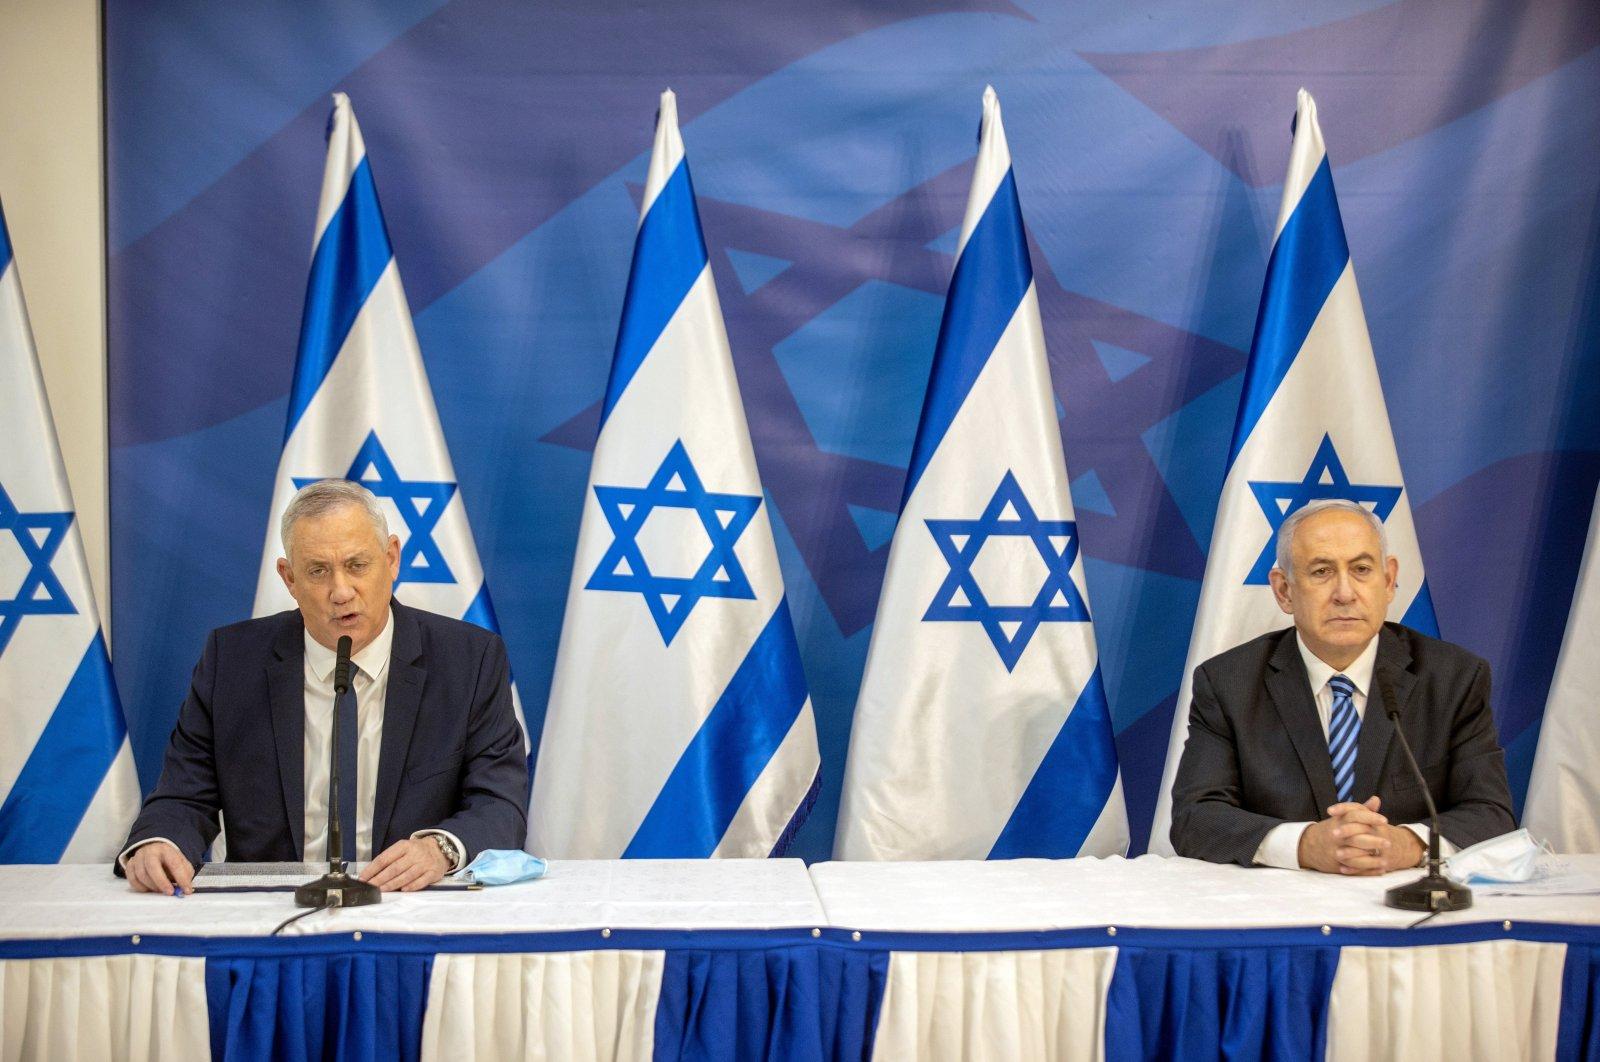 Israeli Prime Minister Benjamin Netanyahu (R) issues a statement alongside alternate prime minister and Defense Minister Benny Gantz at the Israeli Defense Ministry in Tel Aviv, Israel, July 27, 2020. (Reuters Photo)